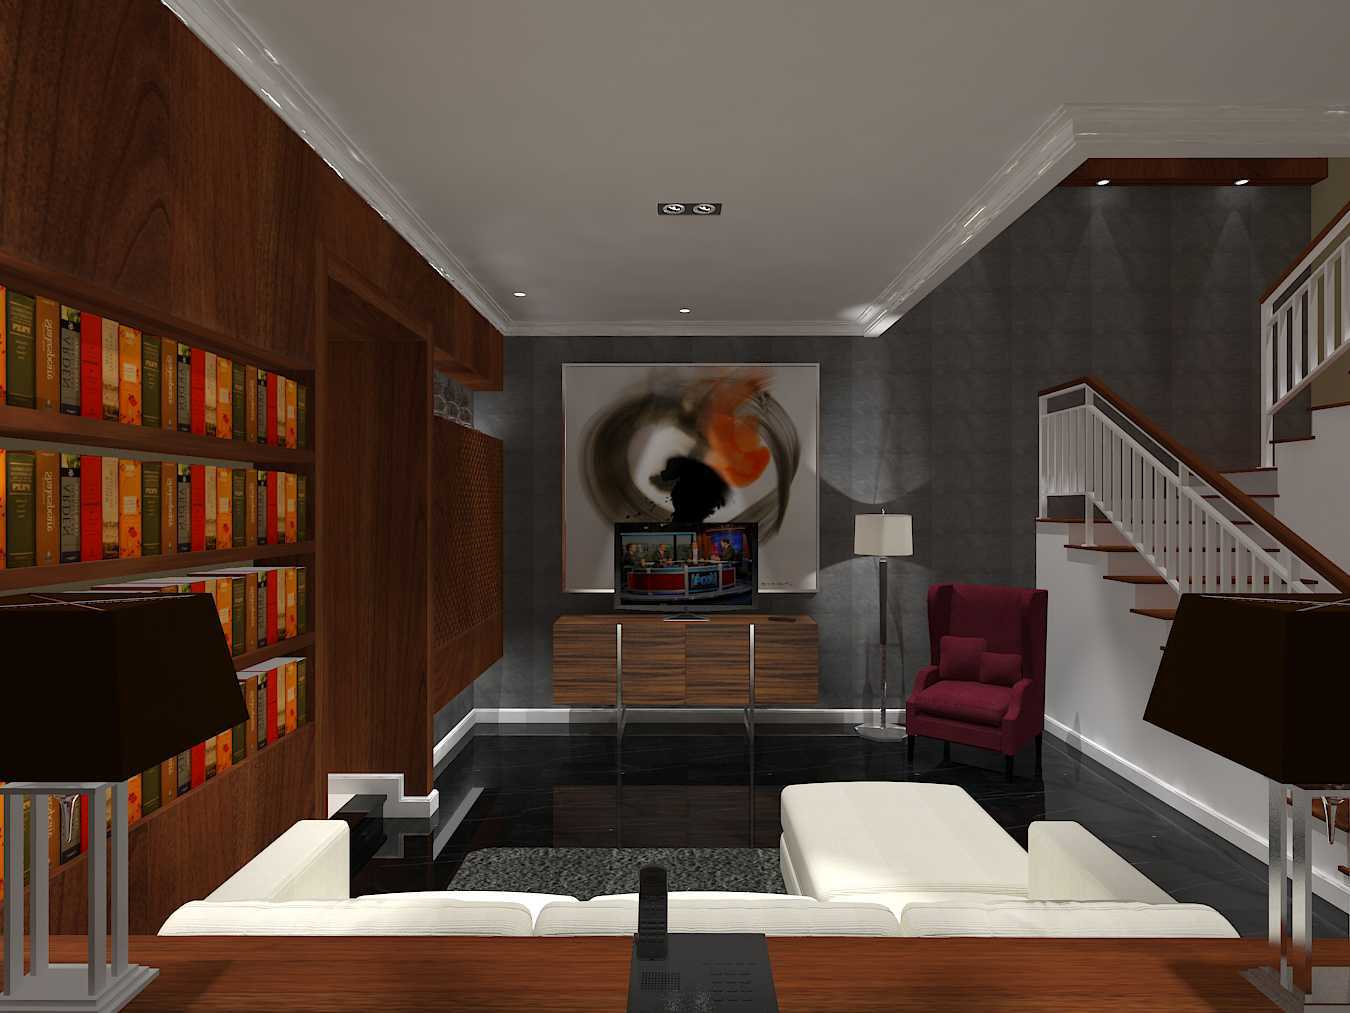 Emil Yusman (E'architect) Tebet Barat Jl. Tebet Barat Viii, Tebet Bar., Tebet, Kota Jakarta Selatan, Daerah Khusus Ibukota Jakarta 12810, Indonesia South Jakarta Living-Room  20196